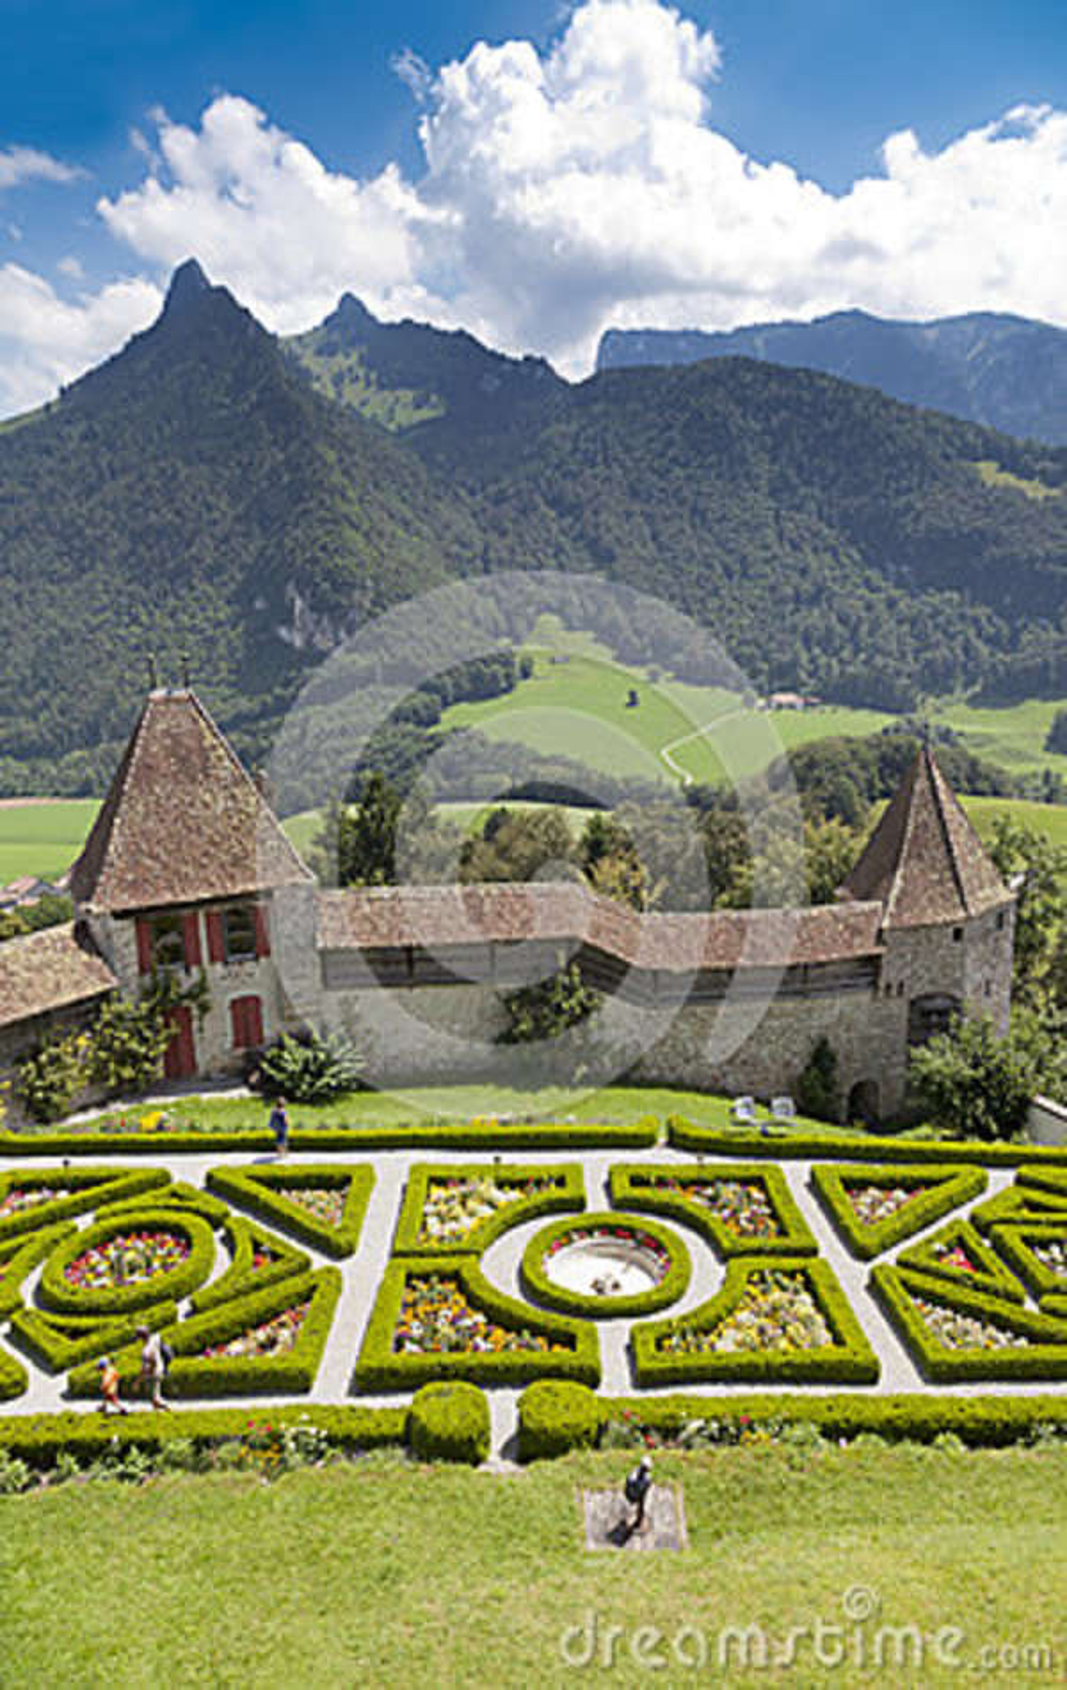 A garden in Gruyere castle in sunny summer day, Switzerland